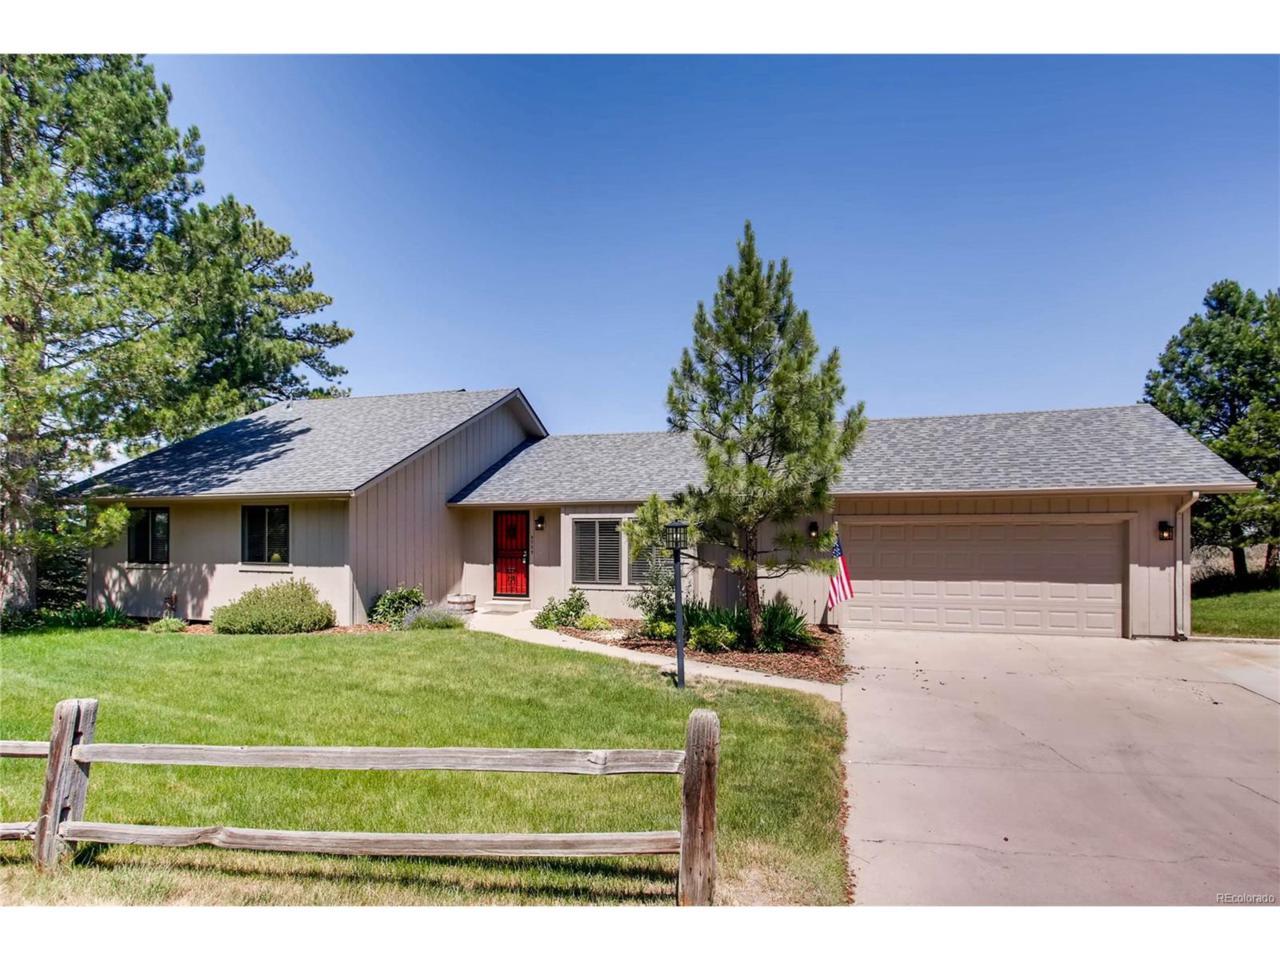 5725 Thunder Hill Road, Parker, CO 80134 (MLS #9896470) :: 8z Real Estate